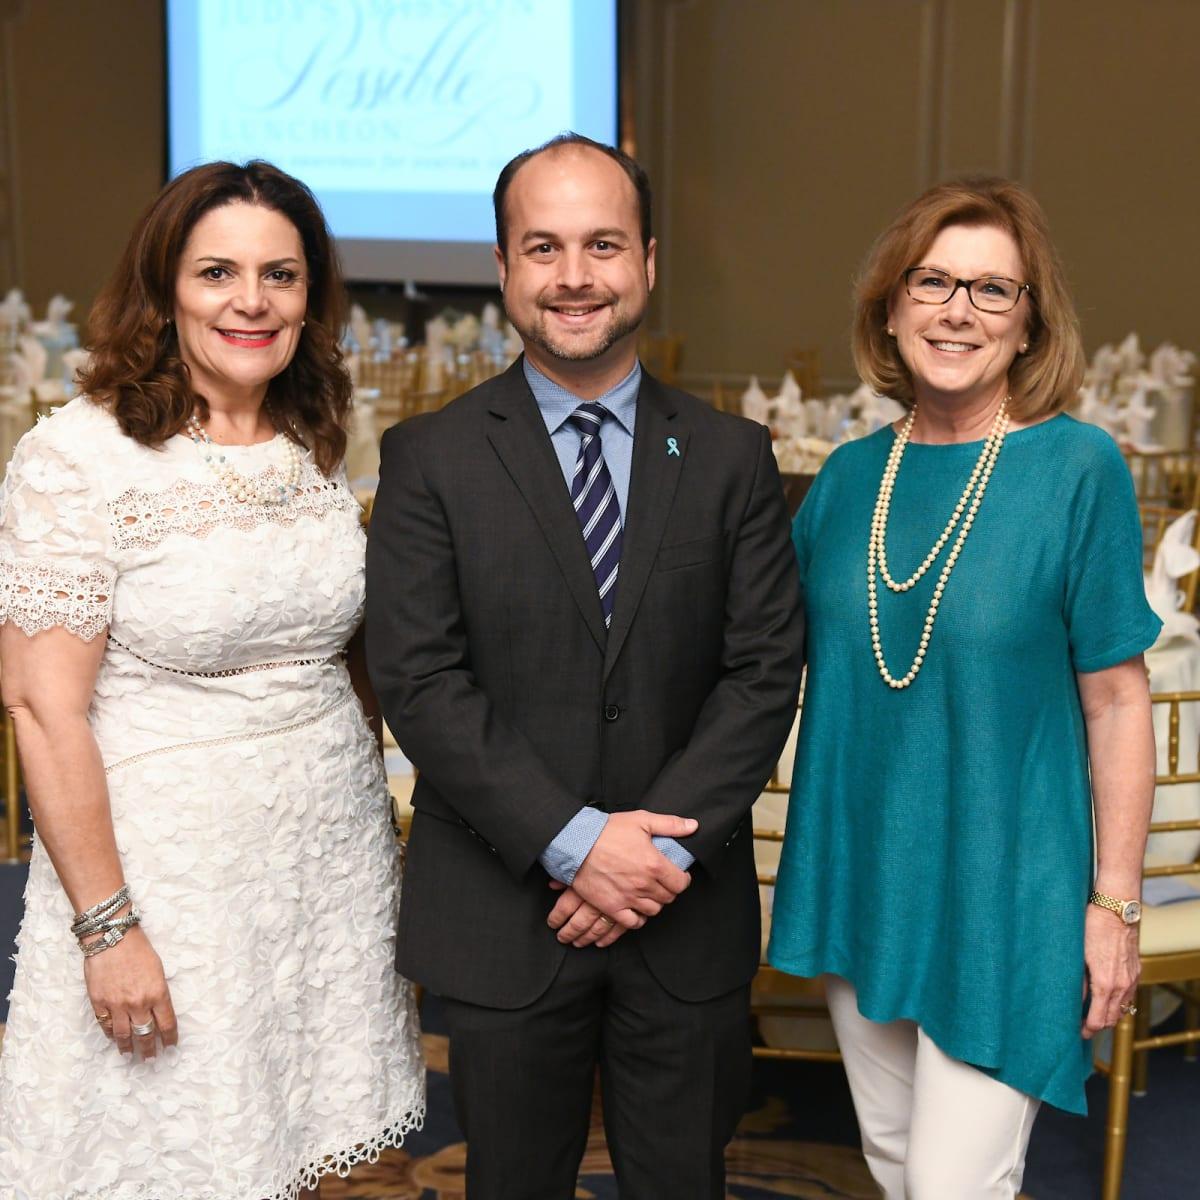 Sonja Massak, Dr. Tyler Hillman and Cindy Winton/JudysMission